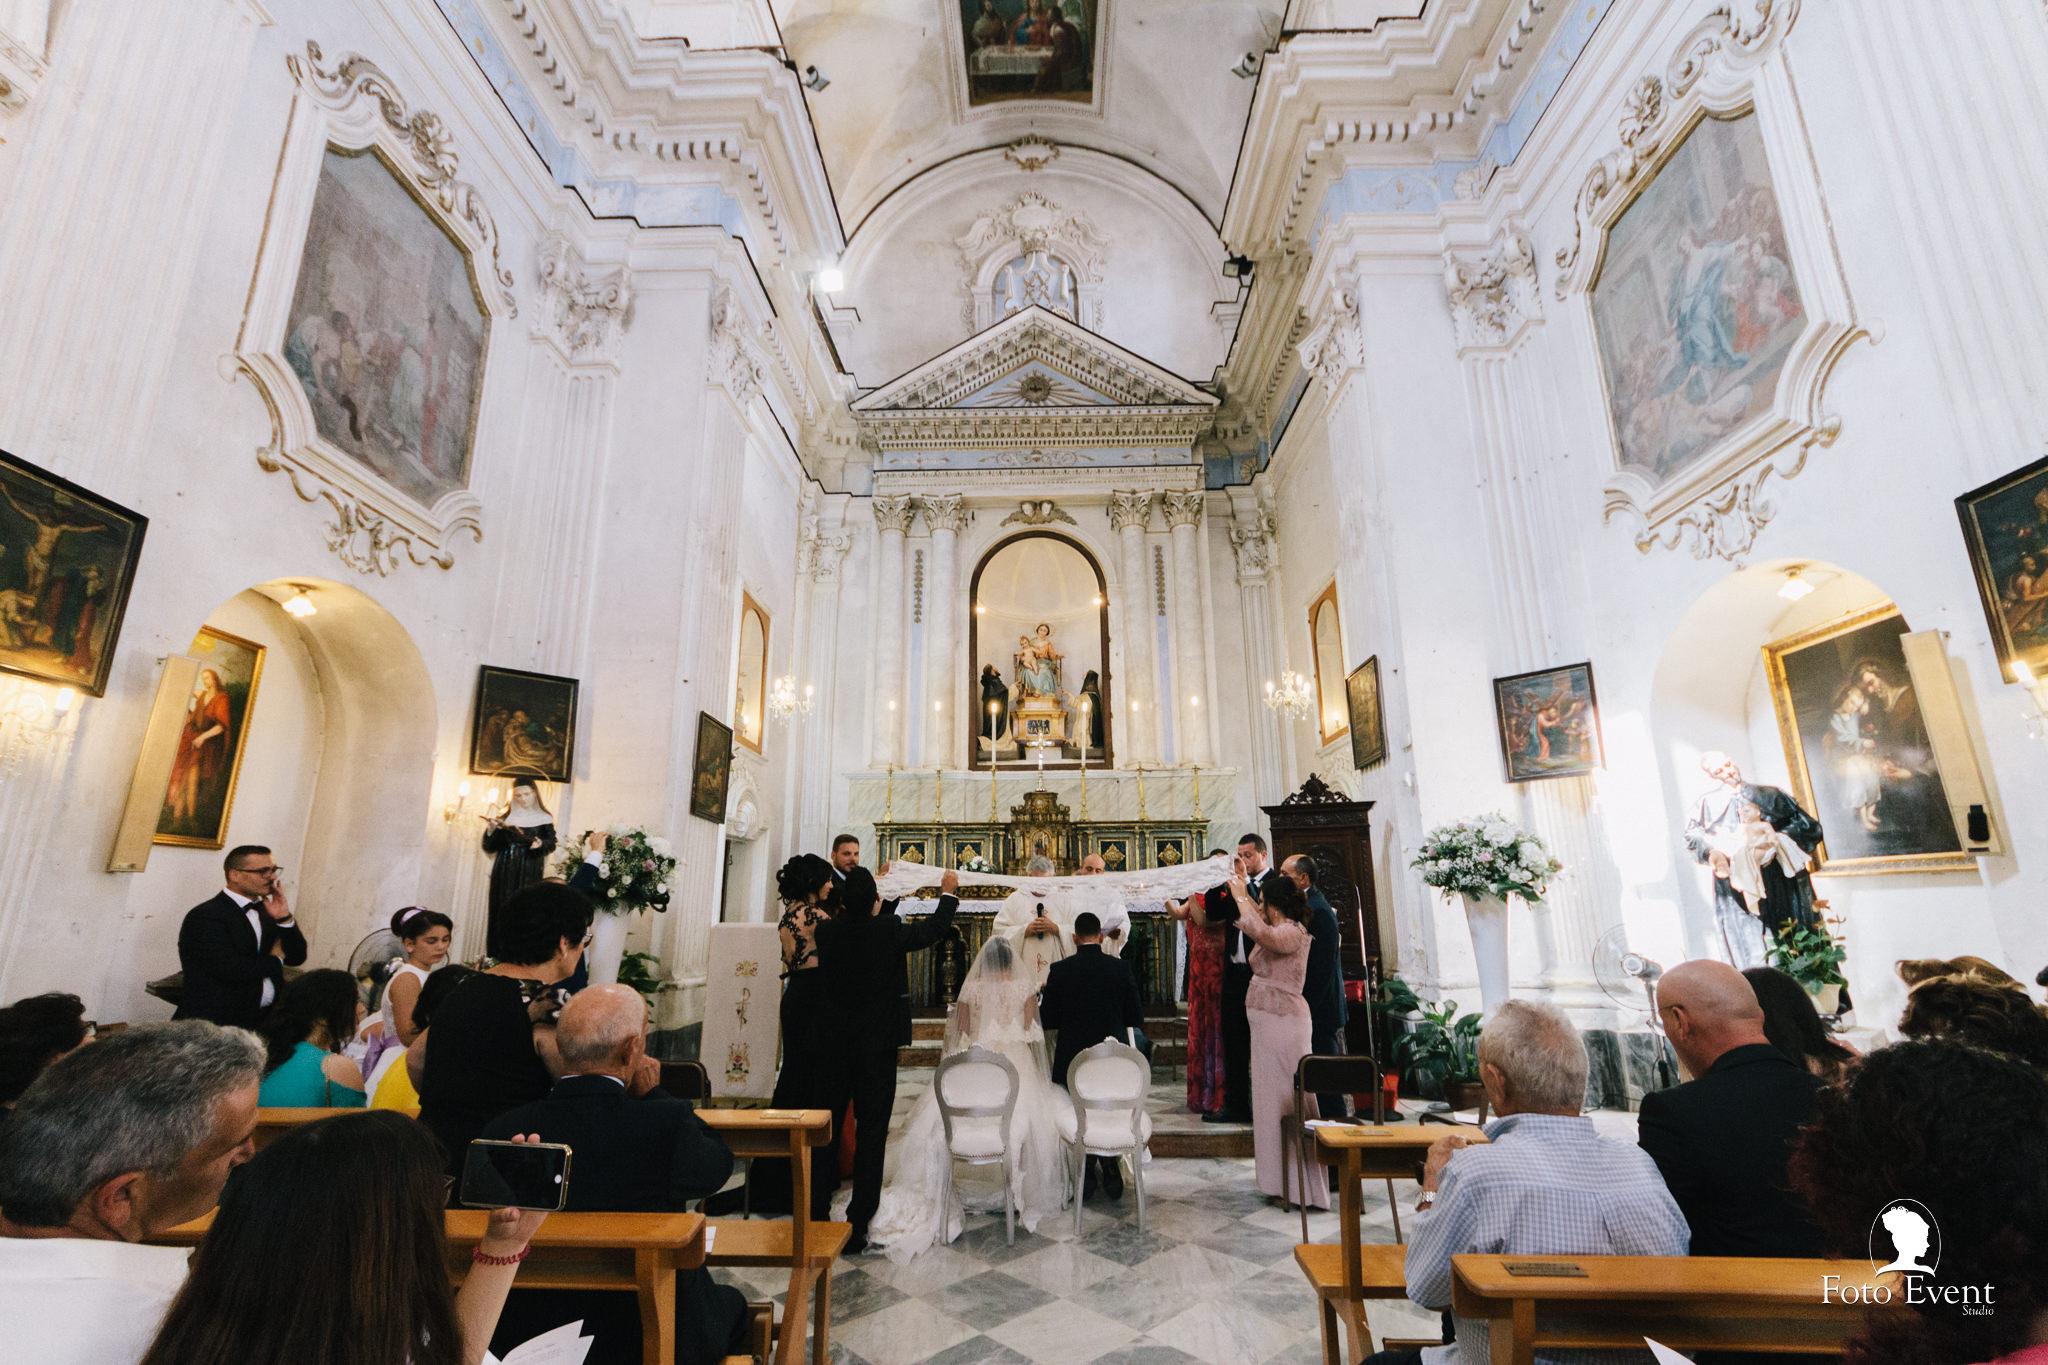 2018-06-29 Matrimonio Angelica e Angelo Bracco Fisheye 042